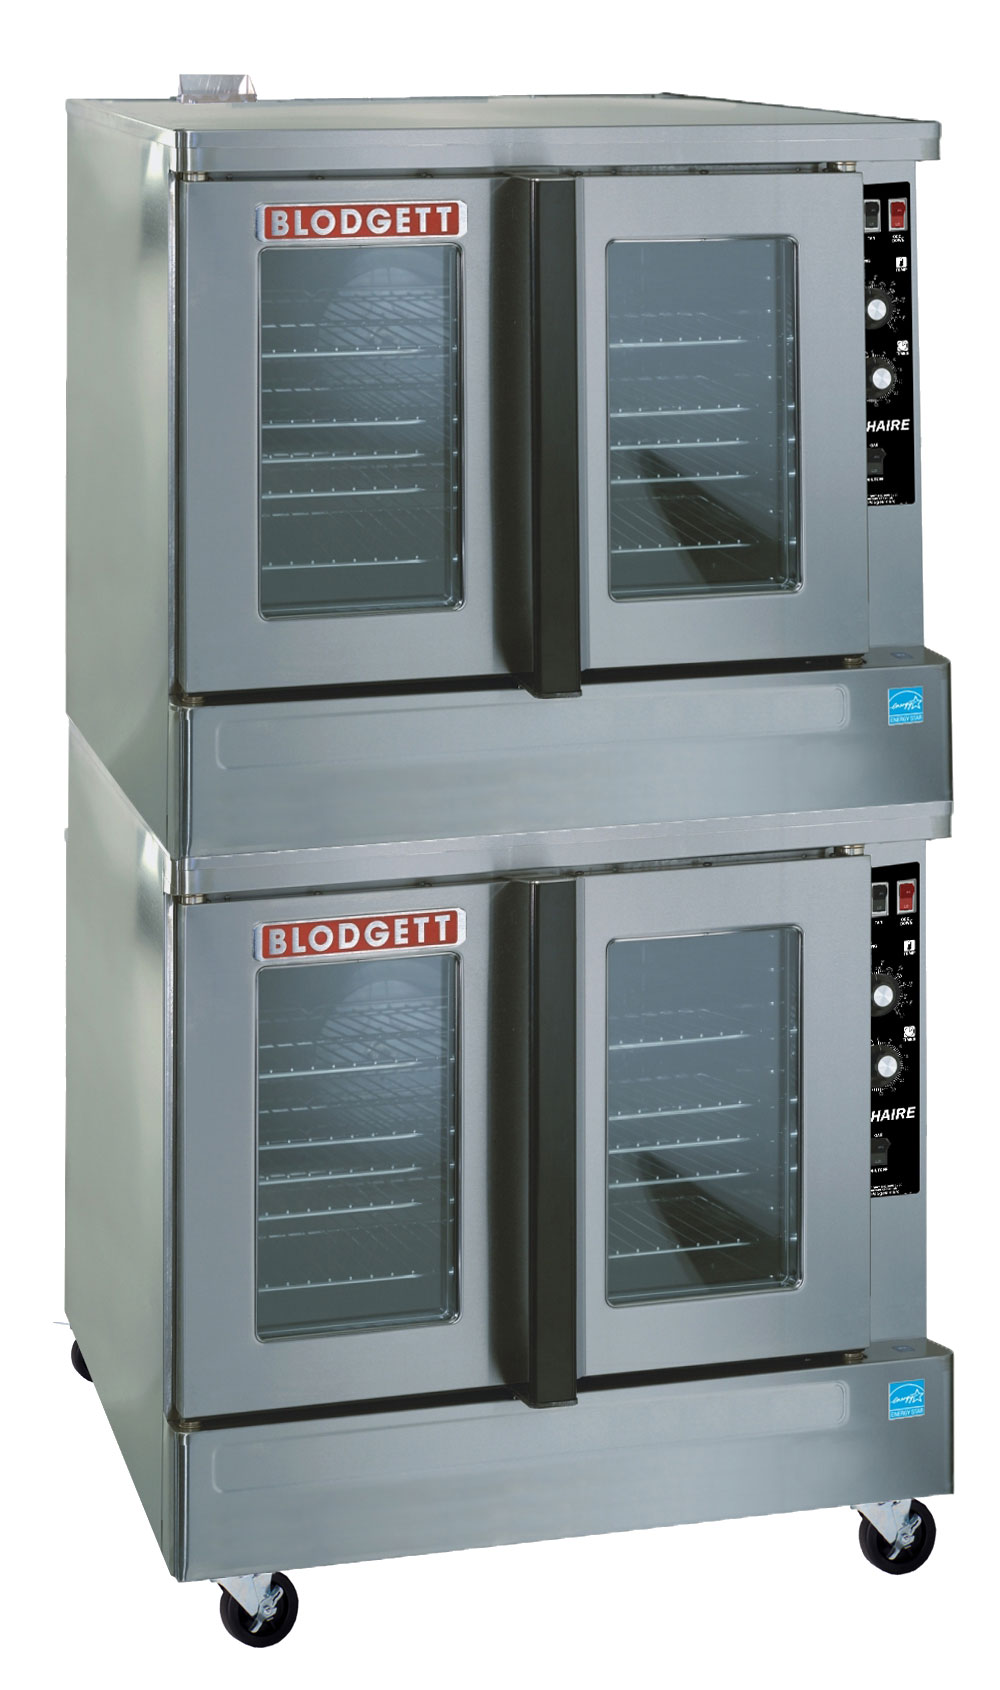 Blodgett ZEPH-100-G-ES DBL convection oven, gas